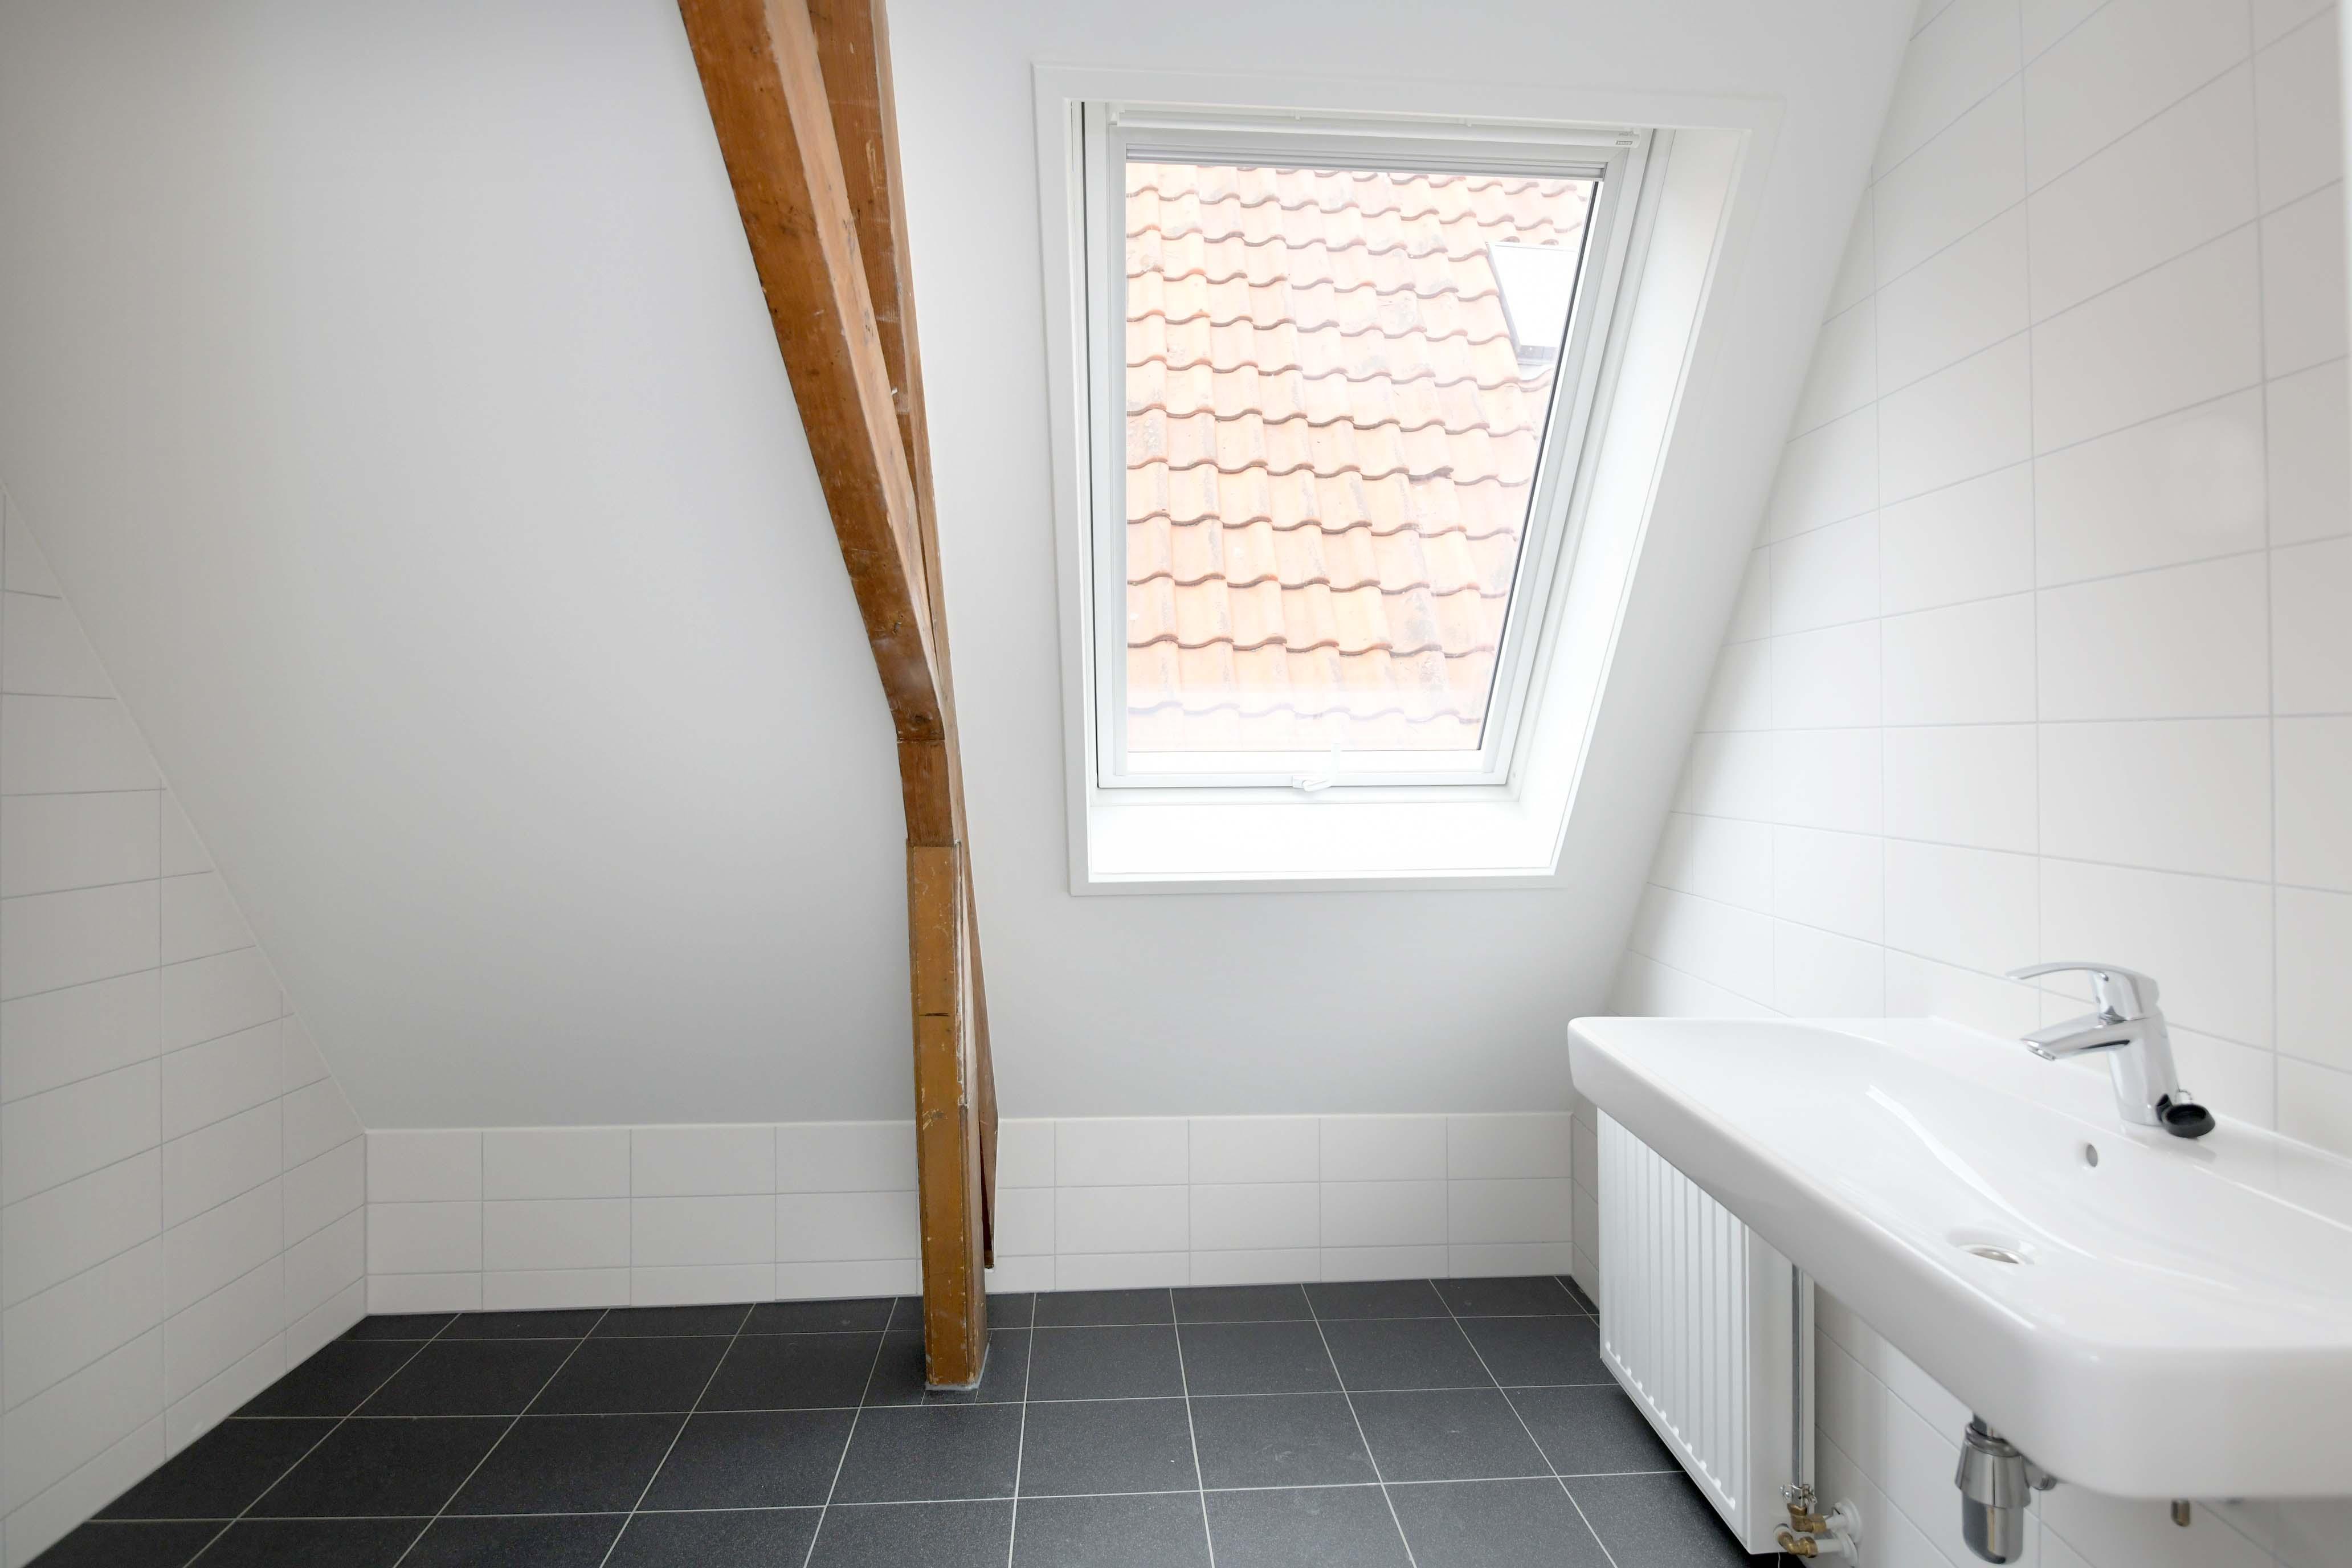 Polstraat badkamer